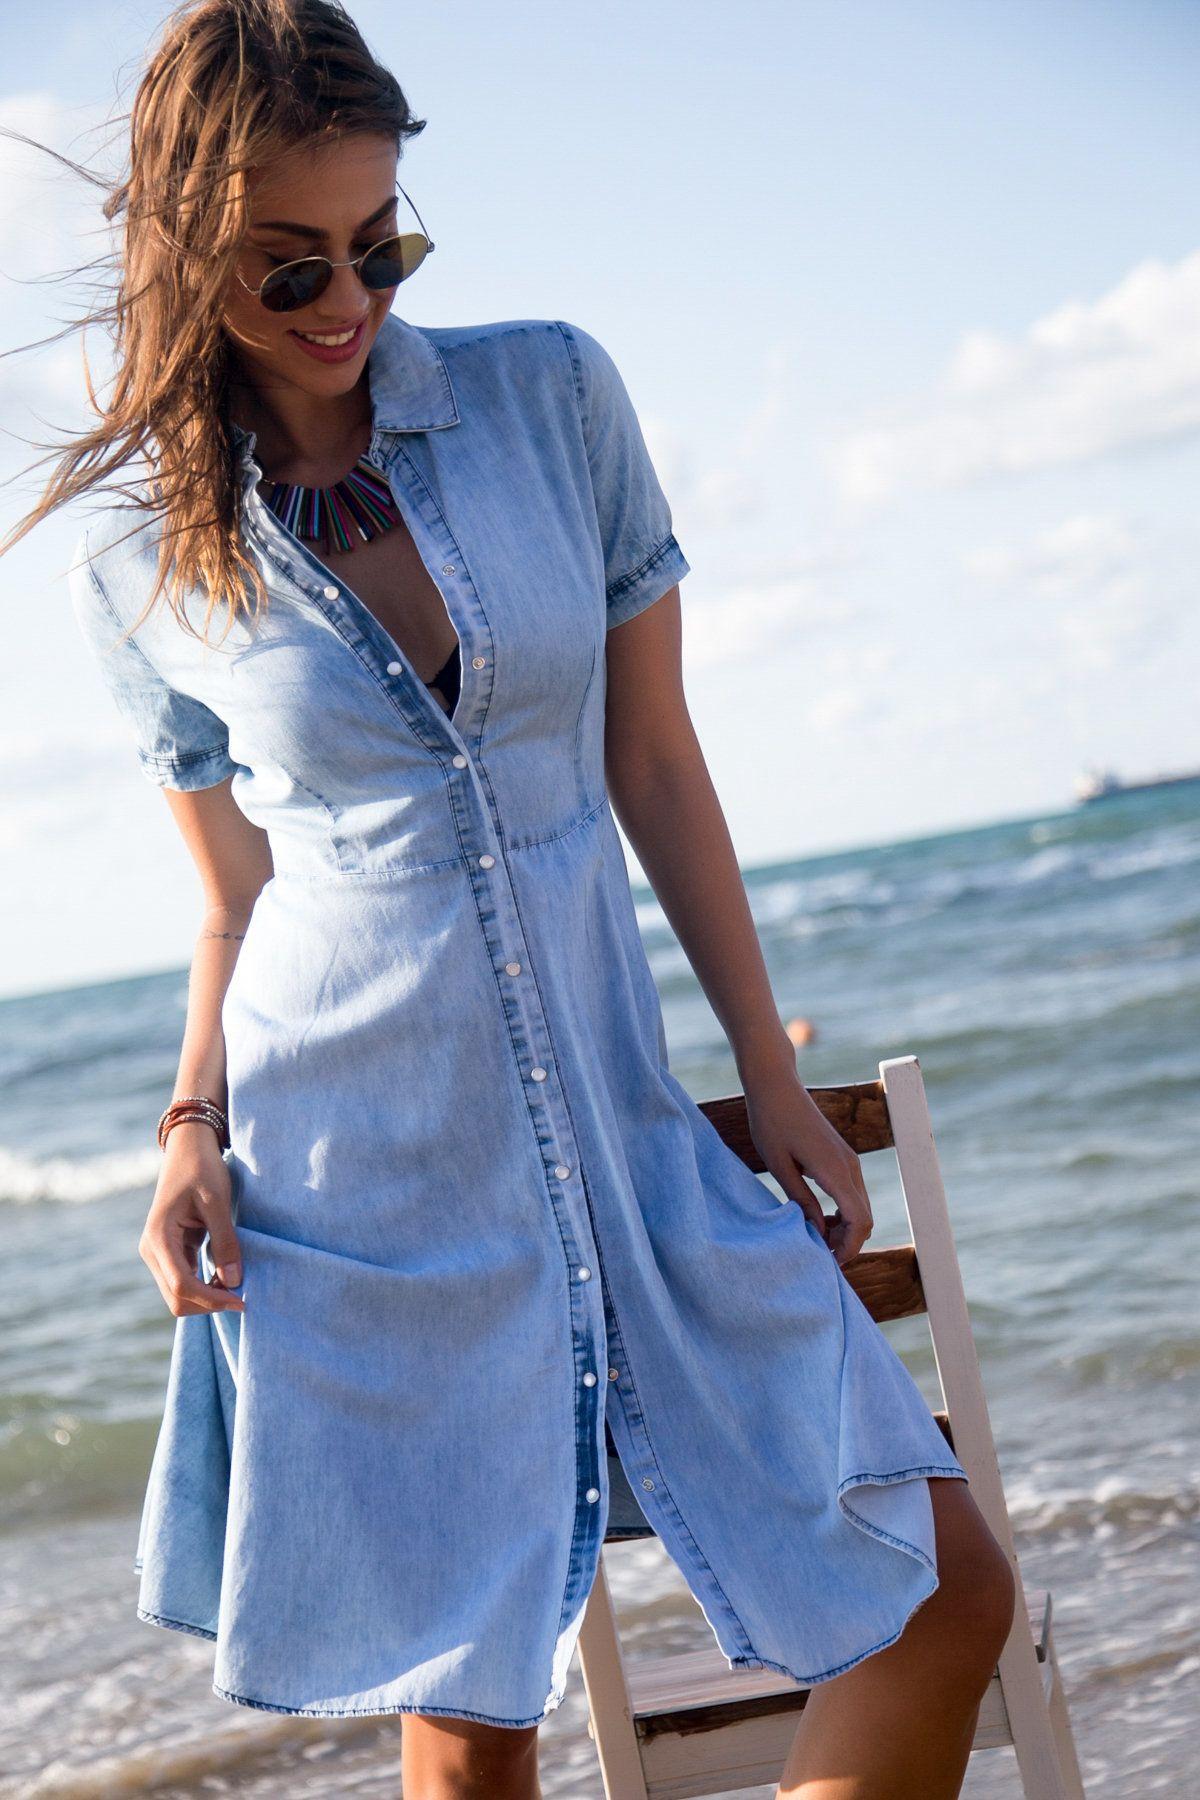 Kadin Mavi Kot Elbise Happiness Ist Trendyol Kot Elbiseler Moda Stilleri Gomlek Elbise